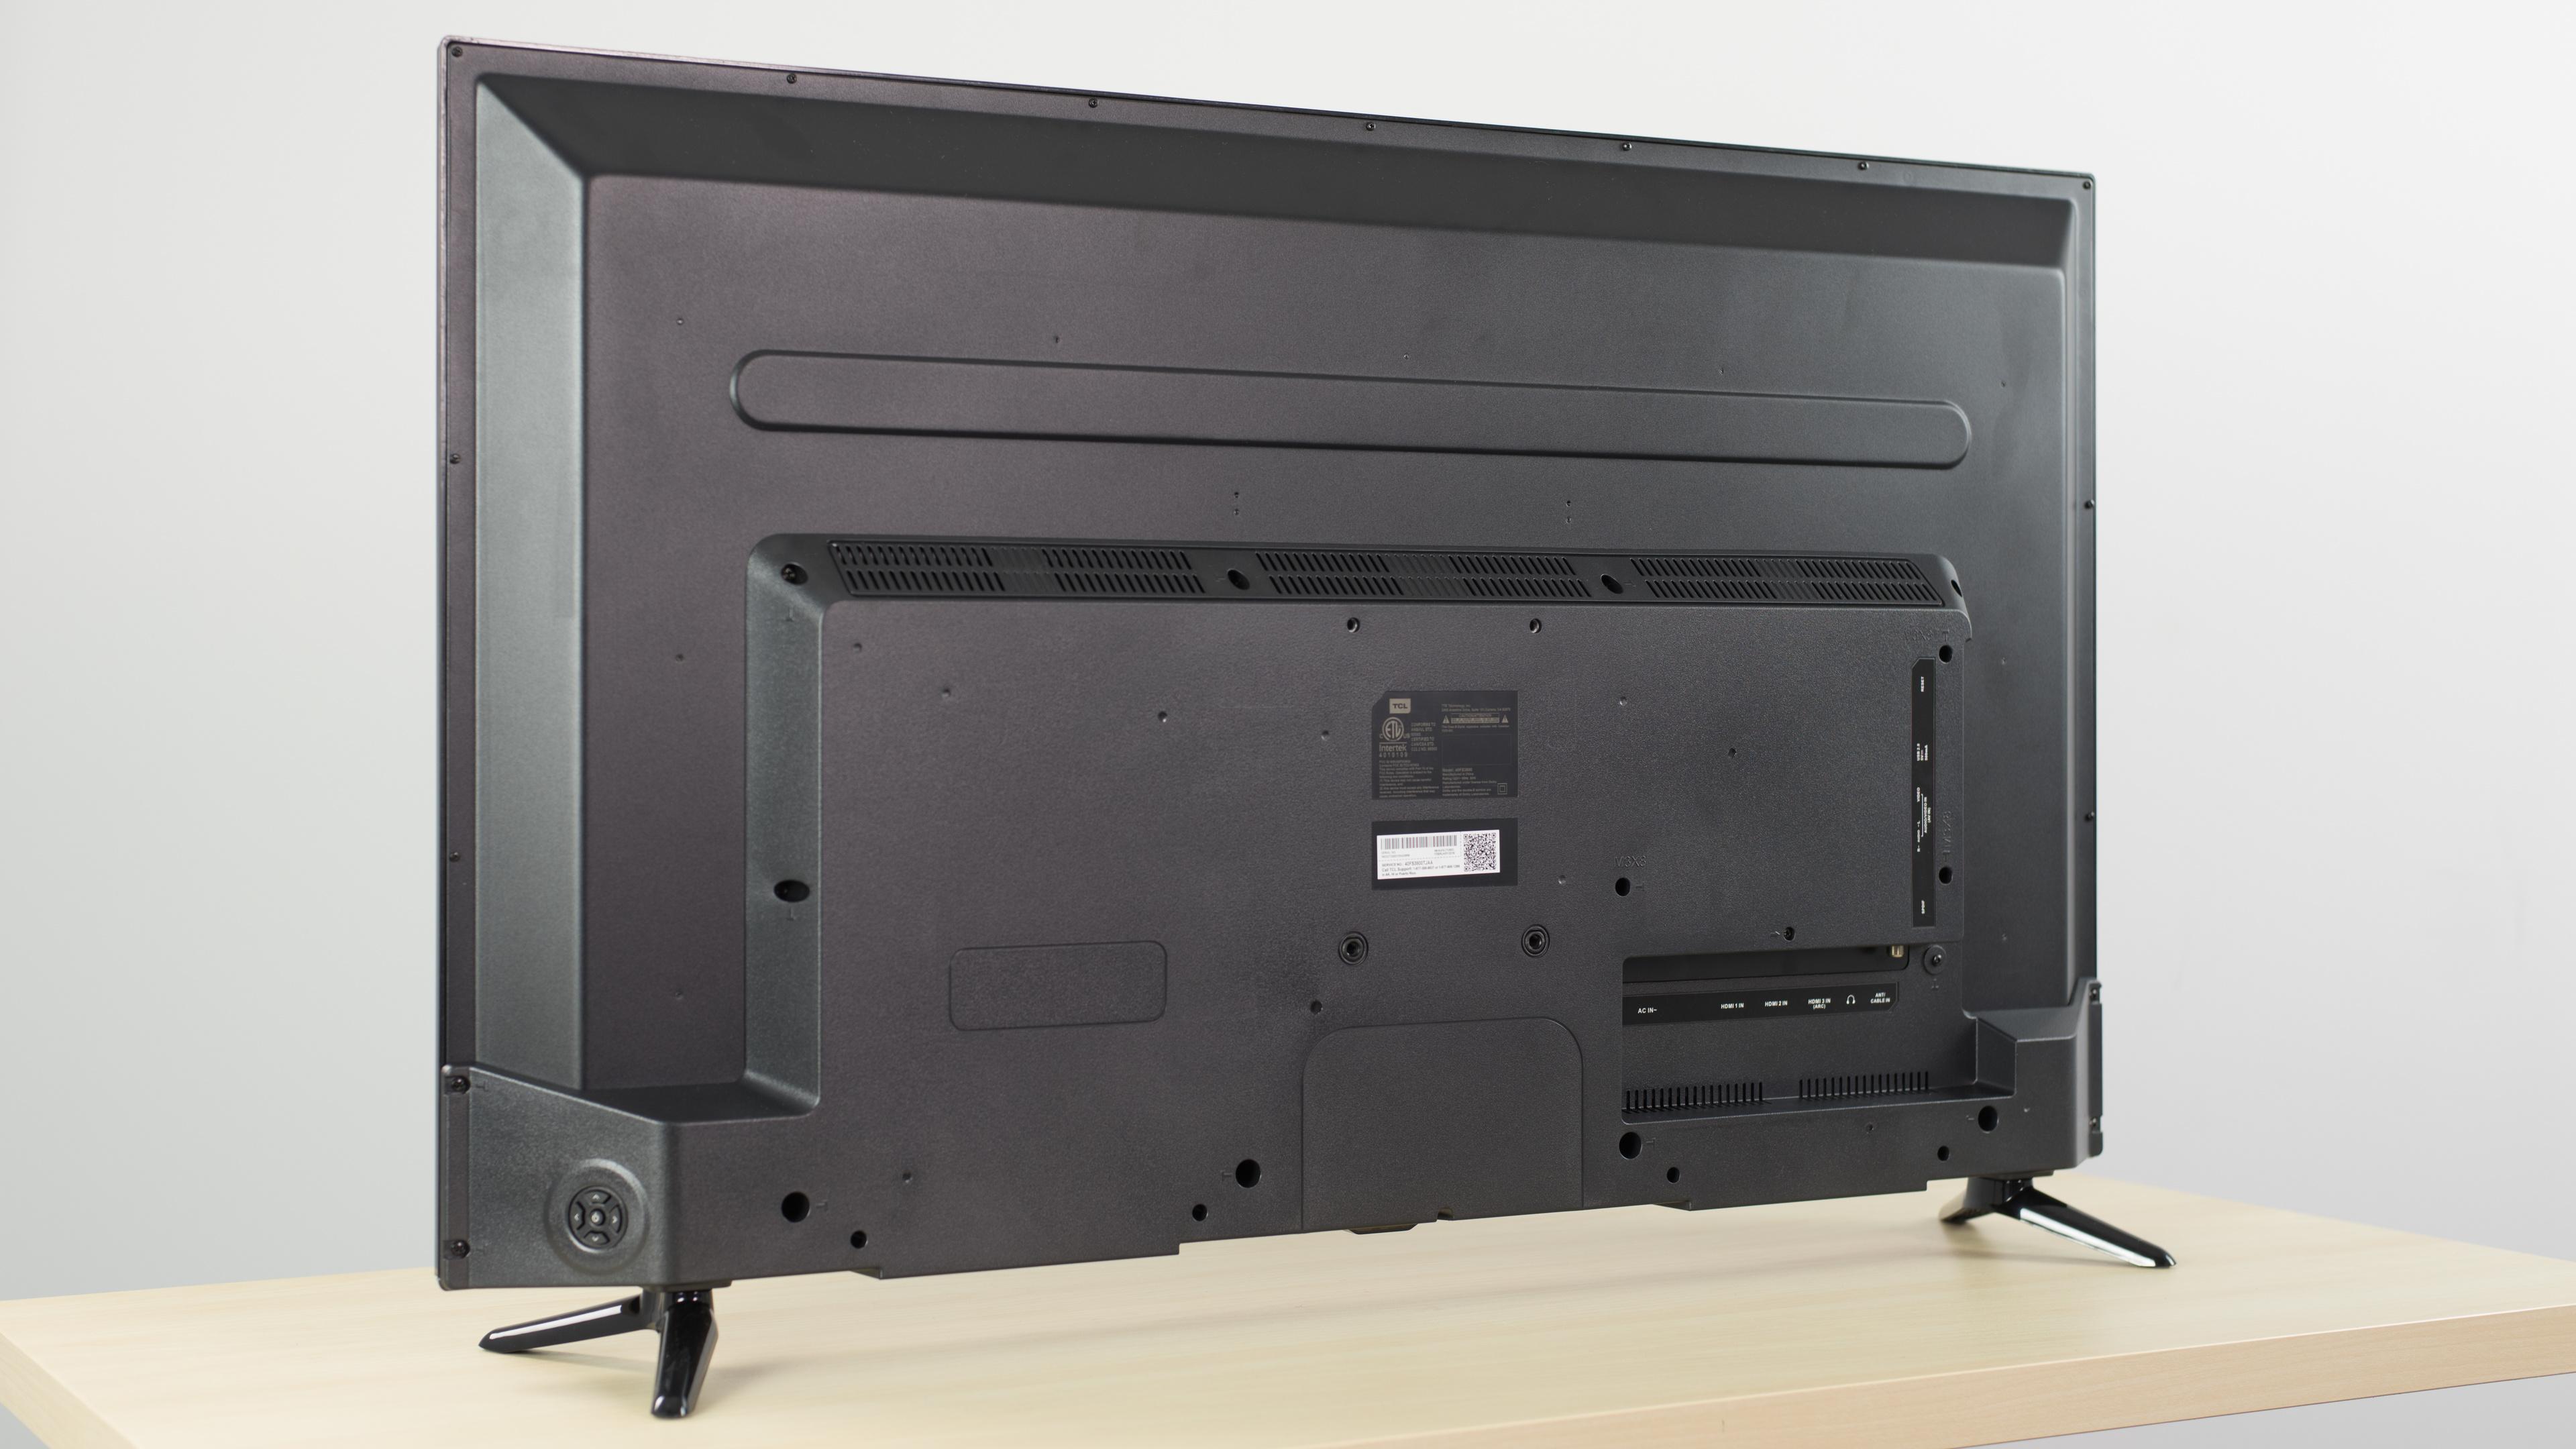 Tcl Fs3800 Review 32s3800 40fs3800 50fs3800